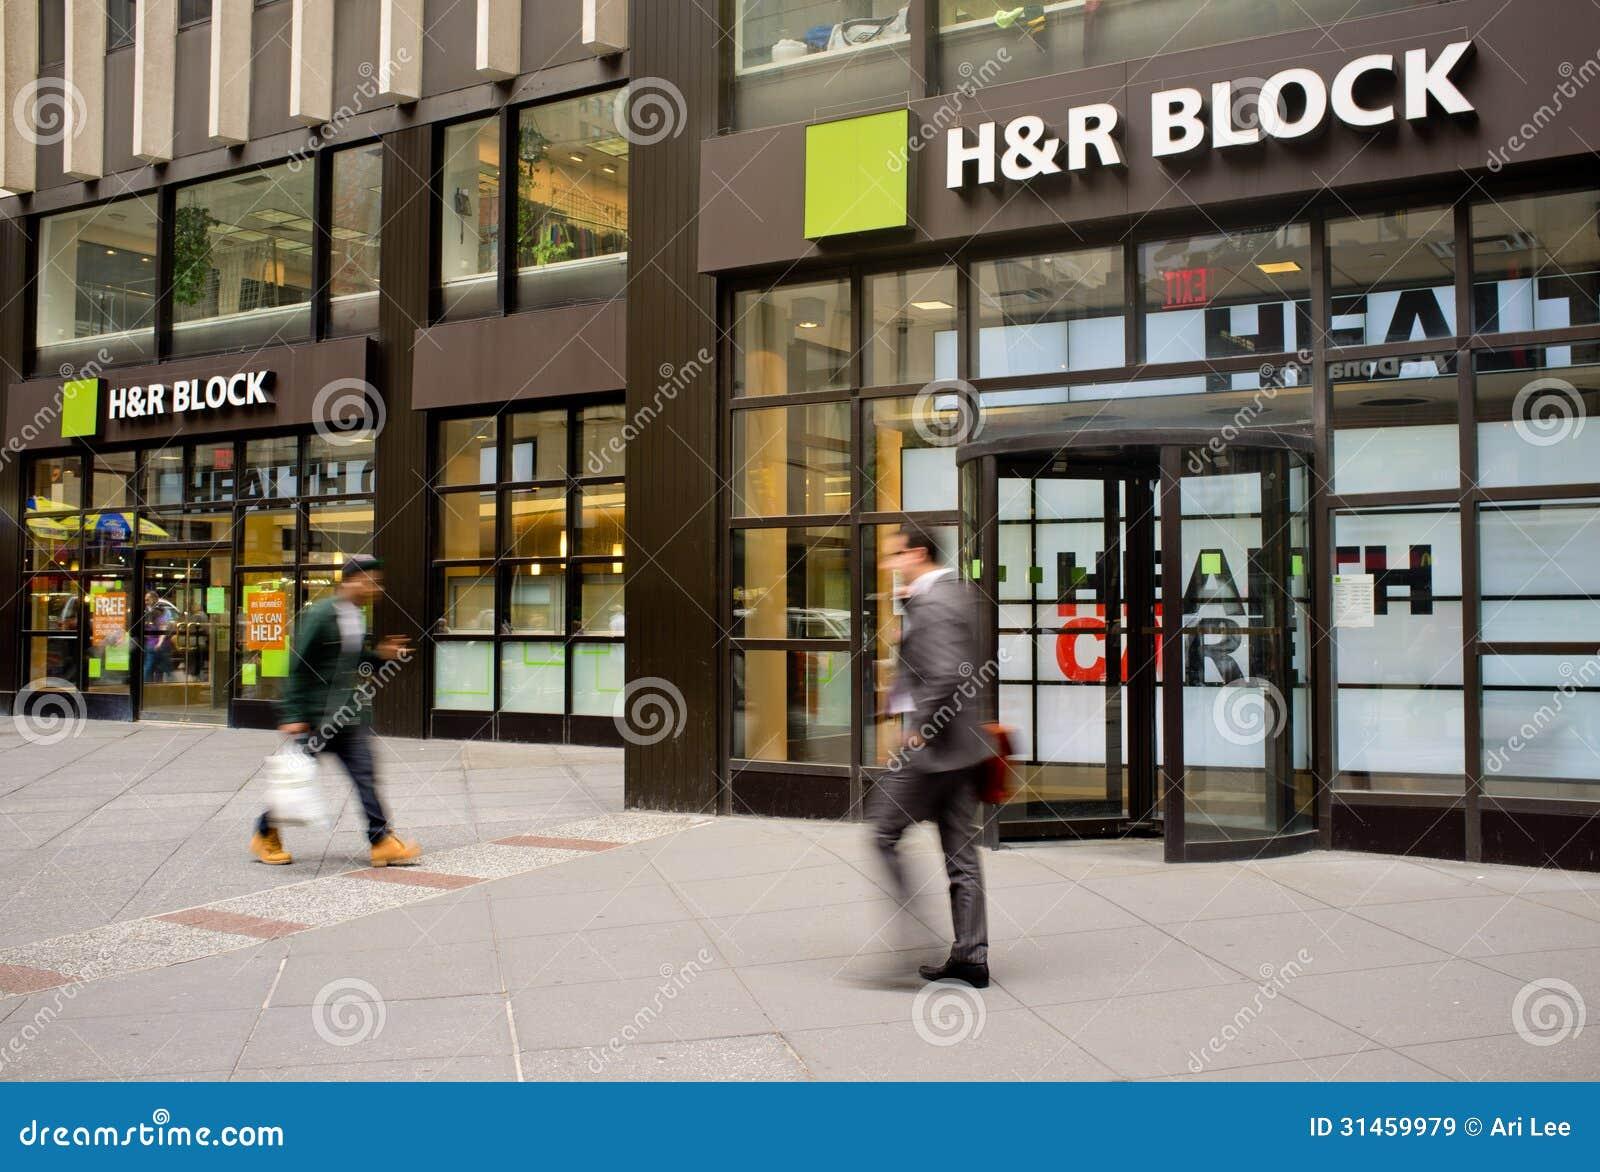 H&r block stock options